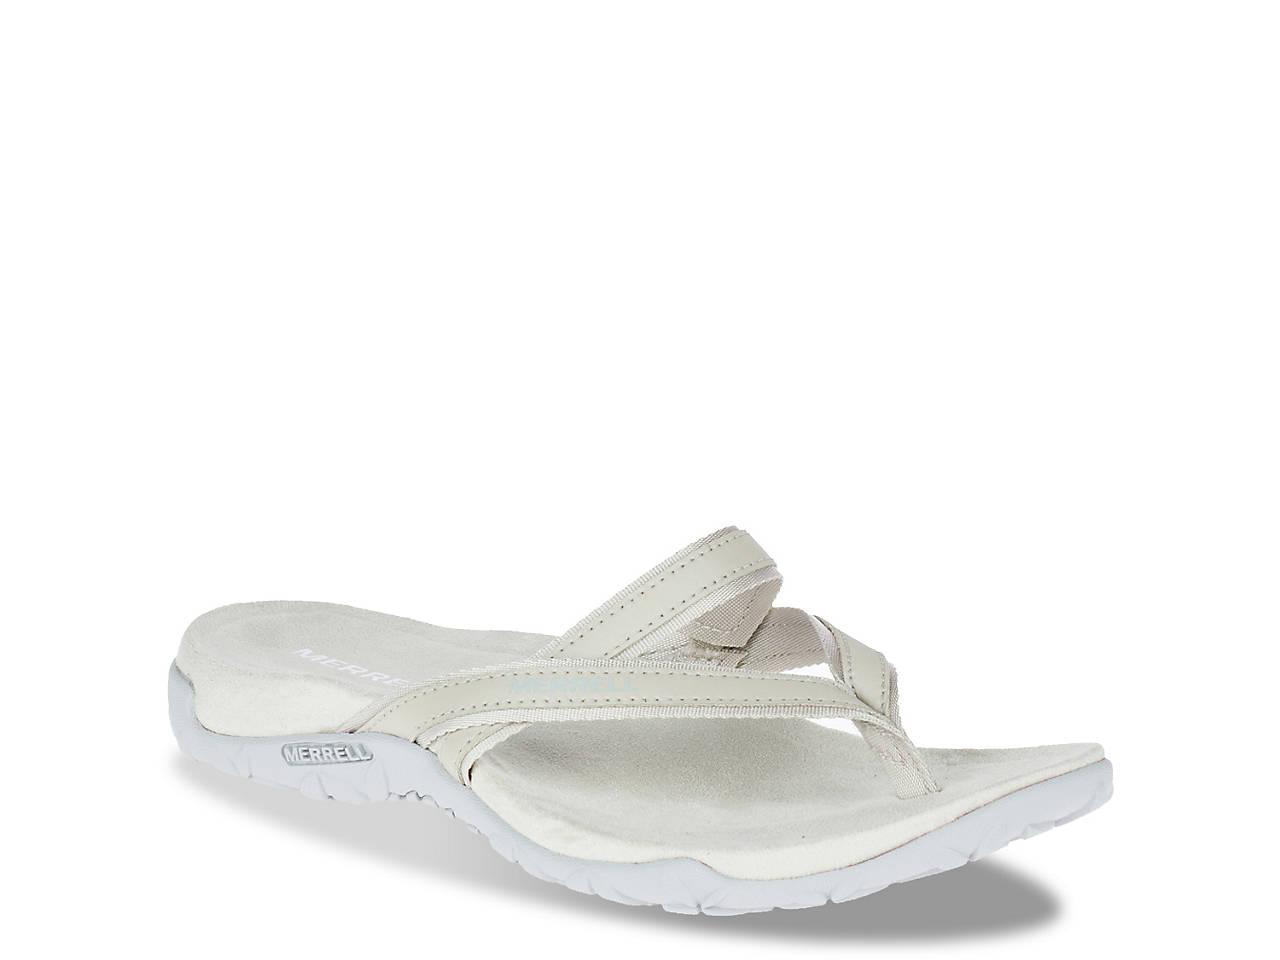 Merrell Terran Ari Post Sandal Women S Shoes Dsw